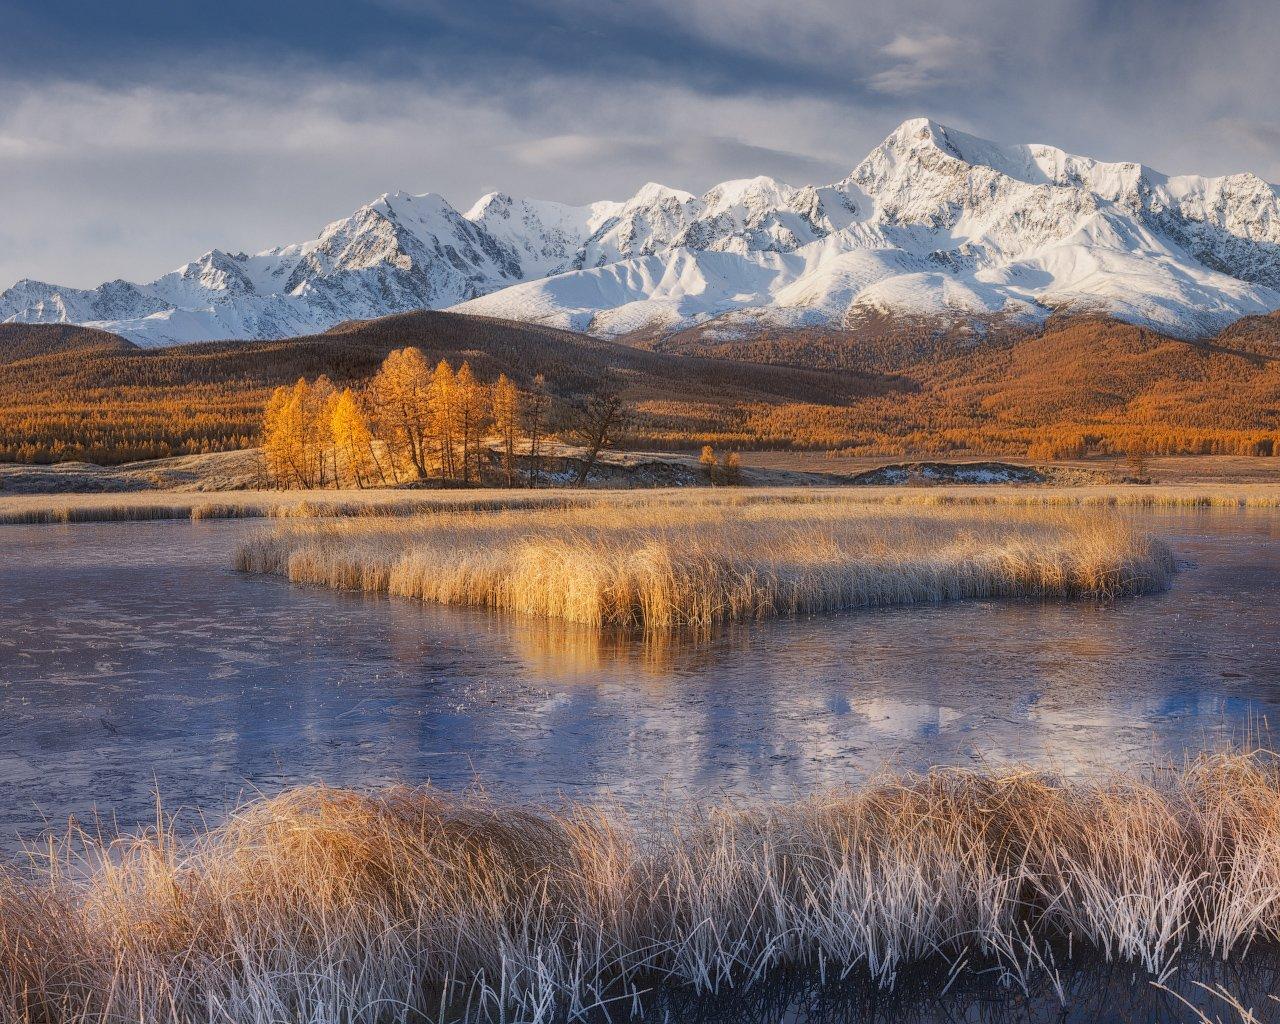 алтай, осень, озеро, горы, Медянцев Дмитрий